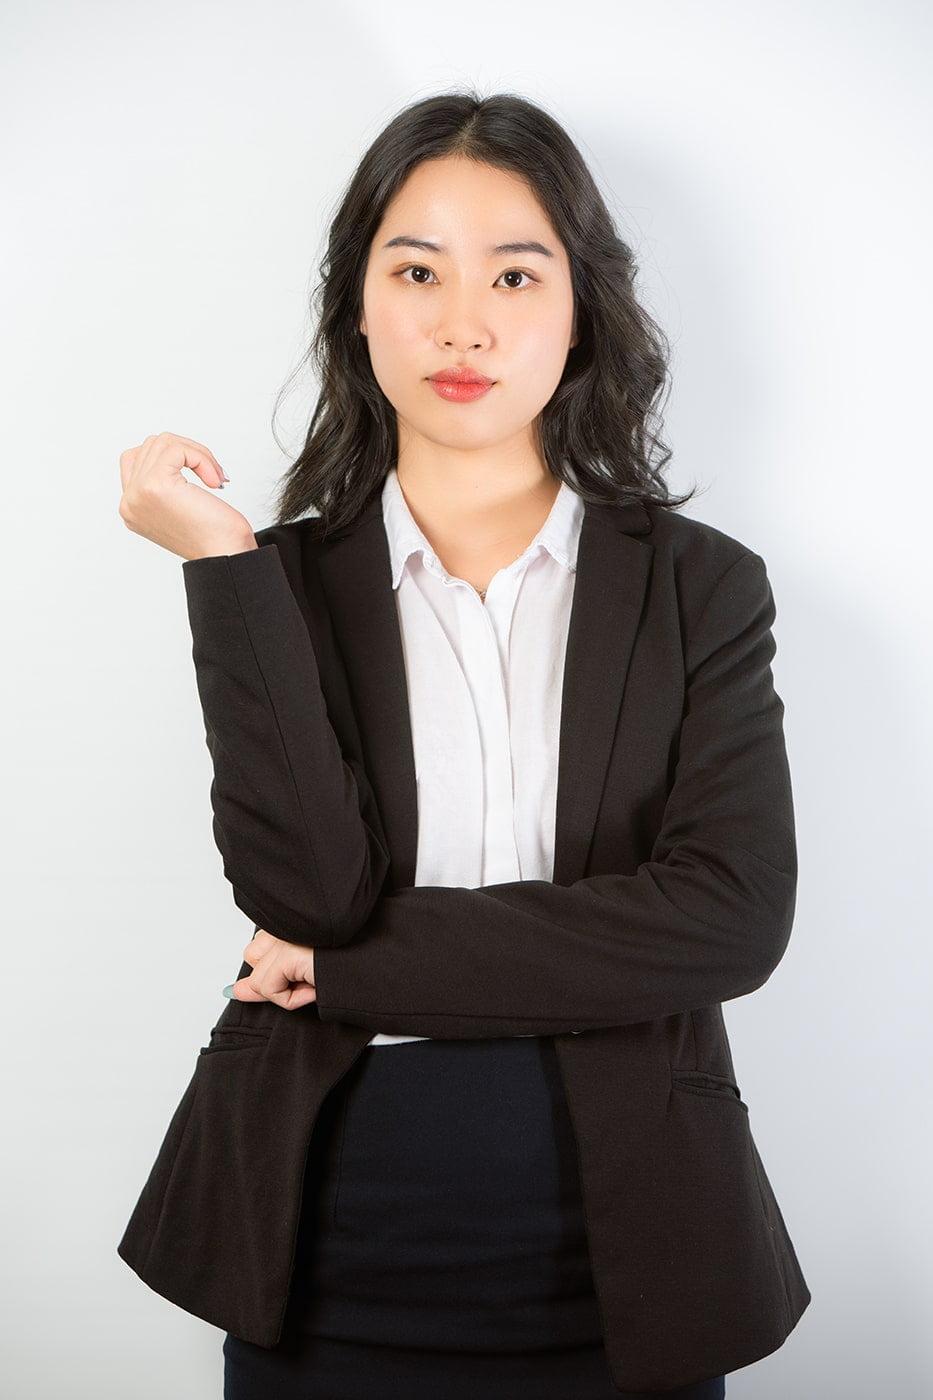 Profile cong ty 21 - Album chụp ảnh profile công ty Luật Dzungsrt Law - HThao Studio